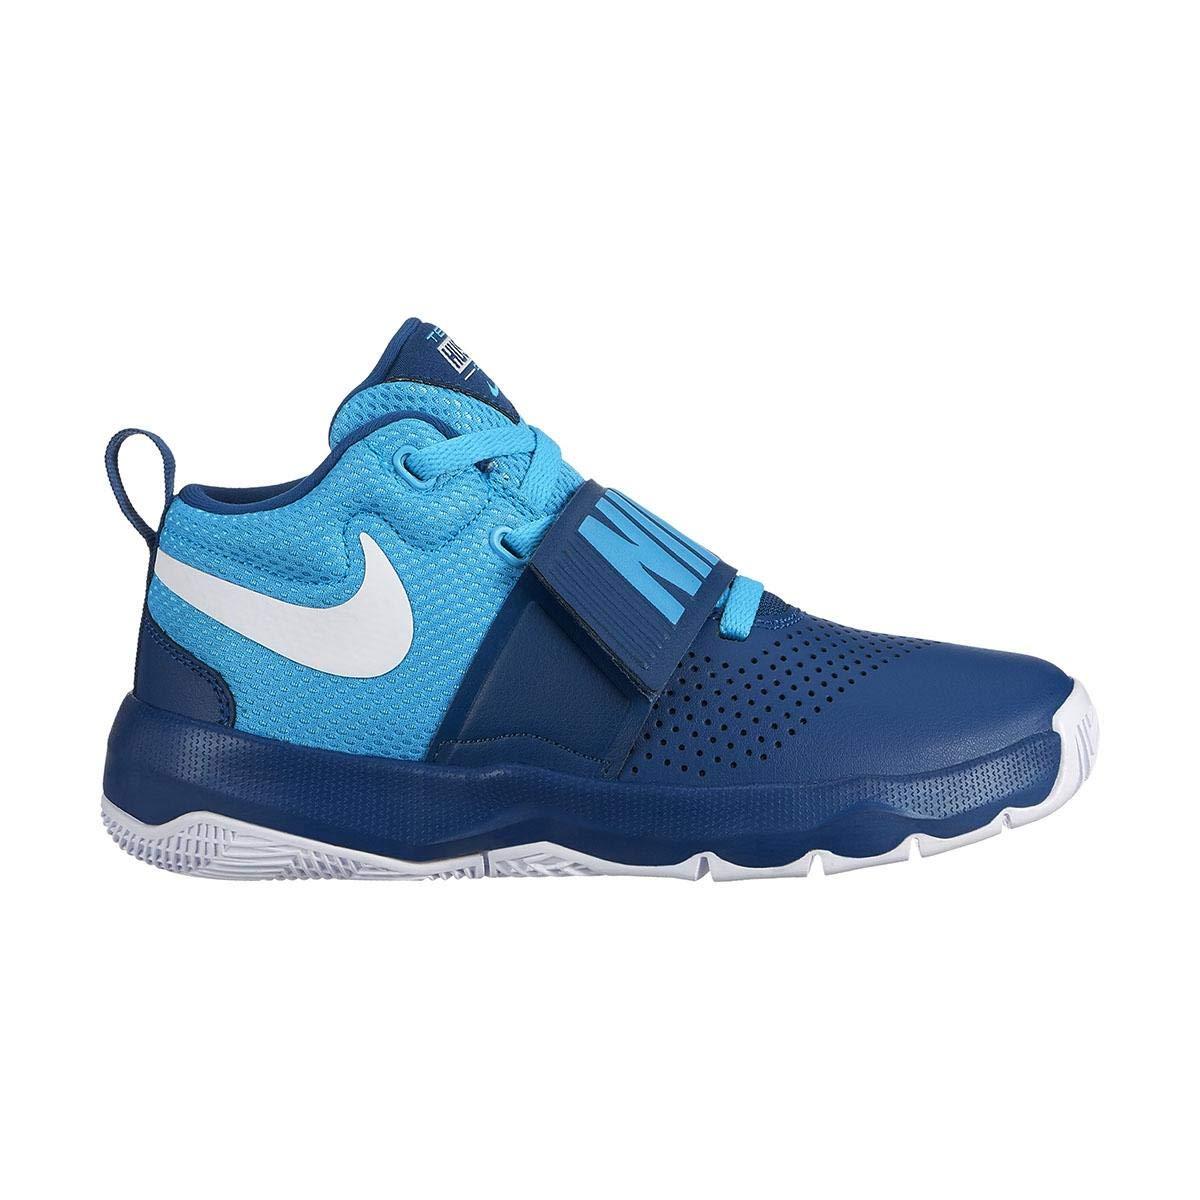 Mehrfarbig (Blau Force  Weiß  Blau Fury 406) Nike Jungen Team Hustle D 8 (Gs) Basketballschuhe